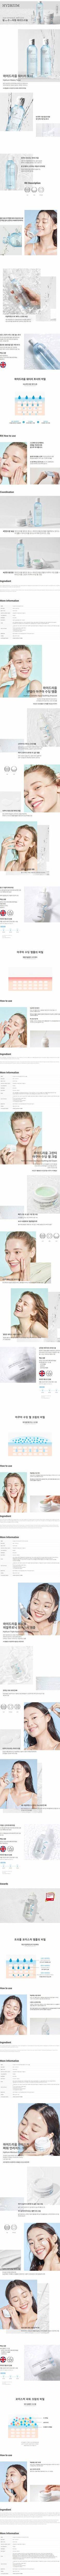 Page Design, Layout Design, Web Design, Beauty Web, Shampoo, Banner, Concept, Skin Care, Cosmetics